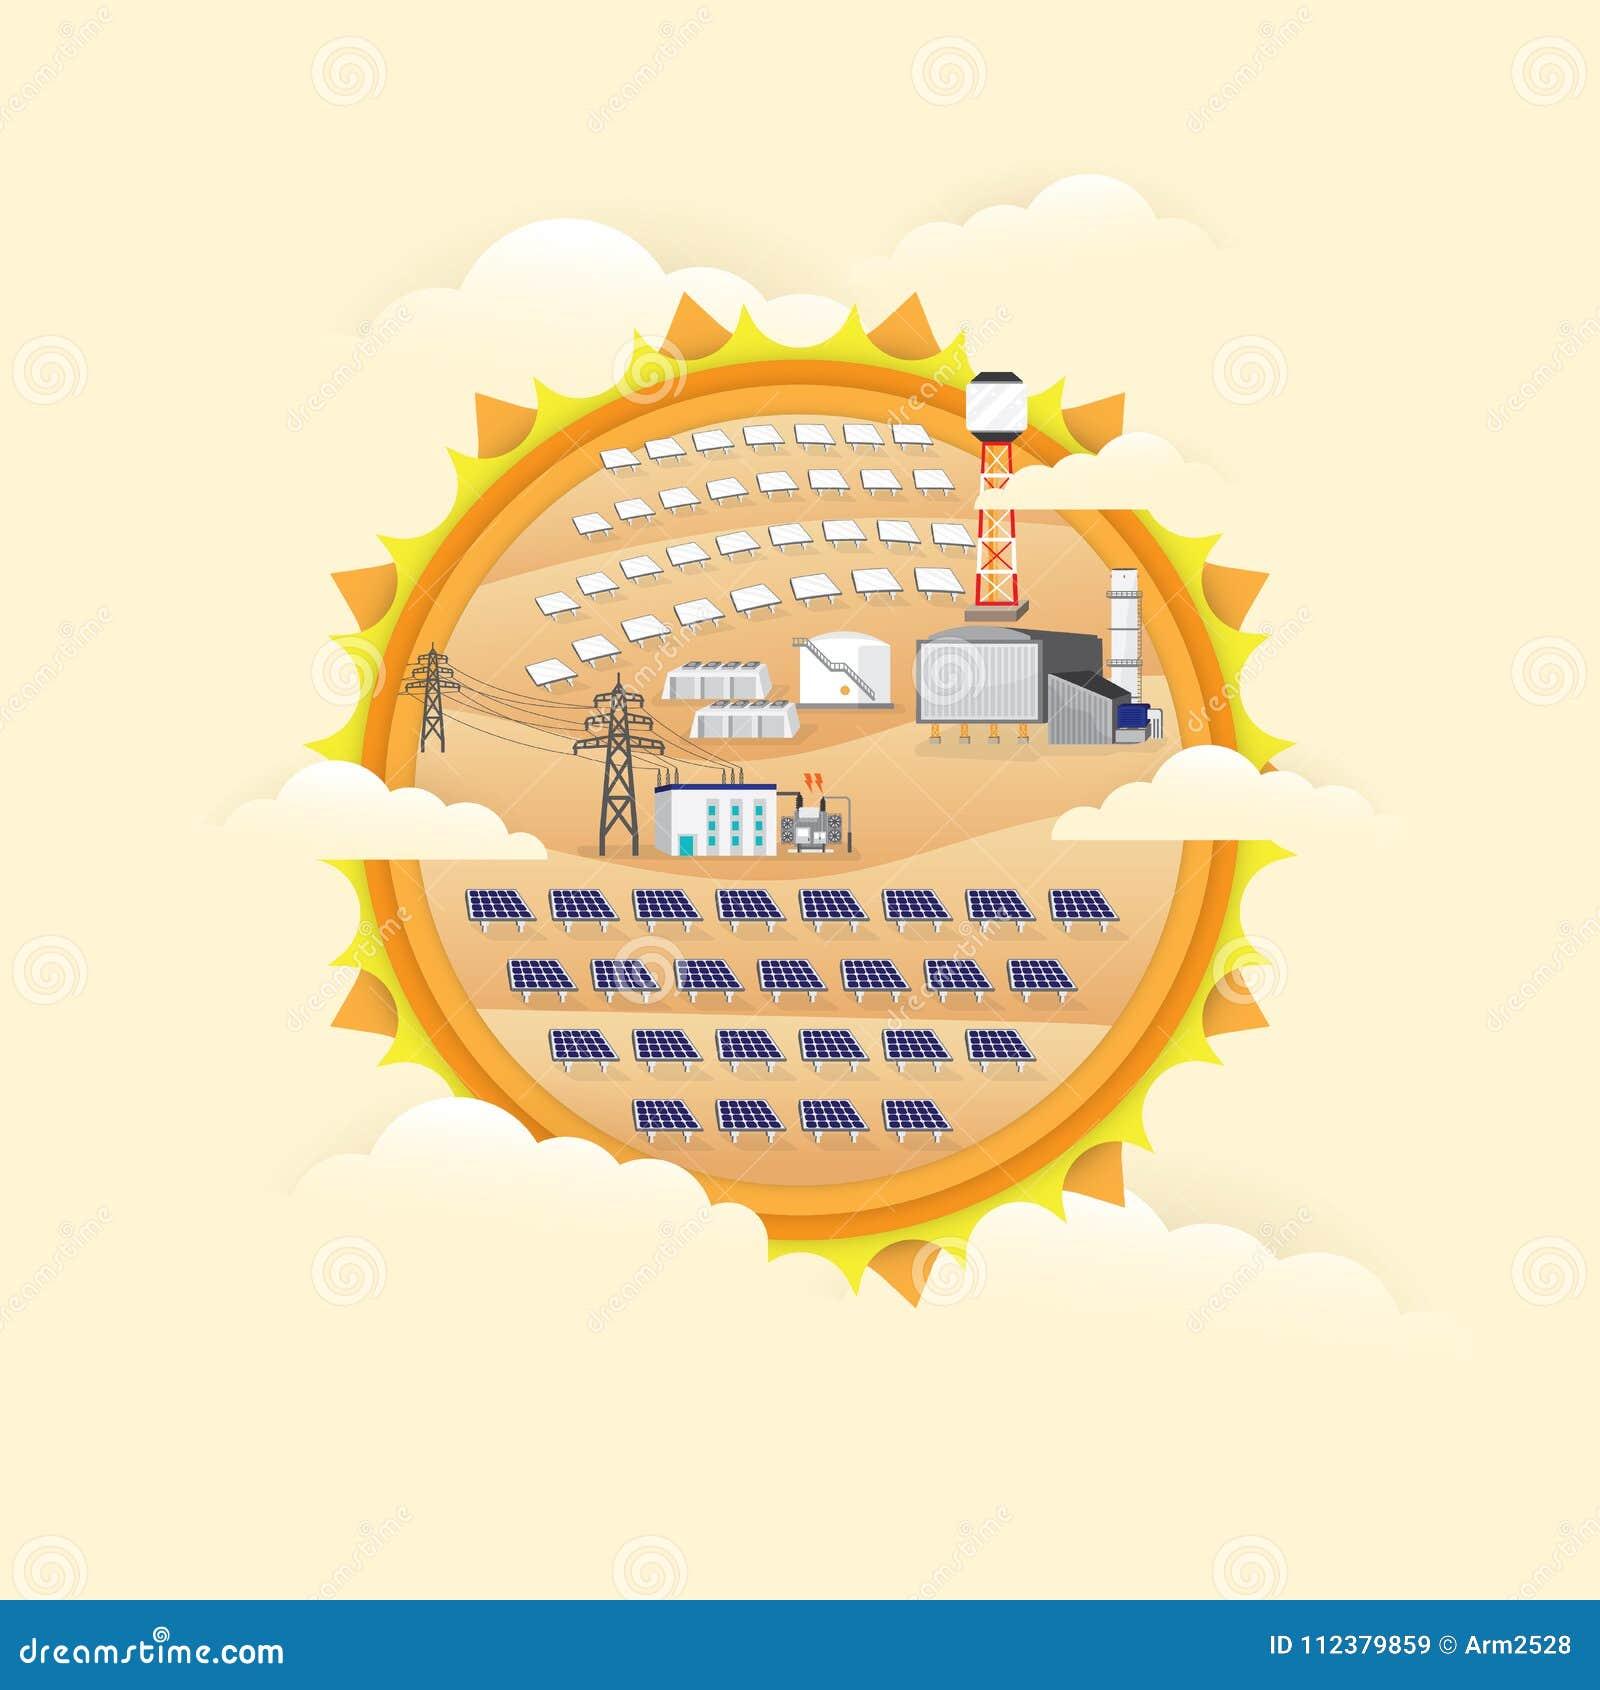 Zonnecelelektrische centrale en zonne thermische elektrische centrale